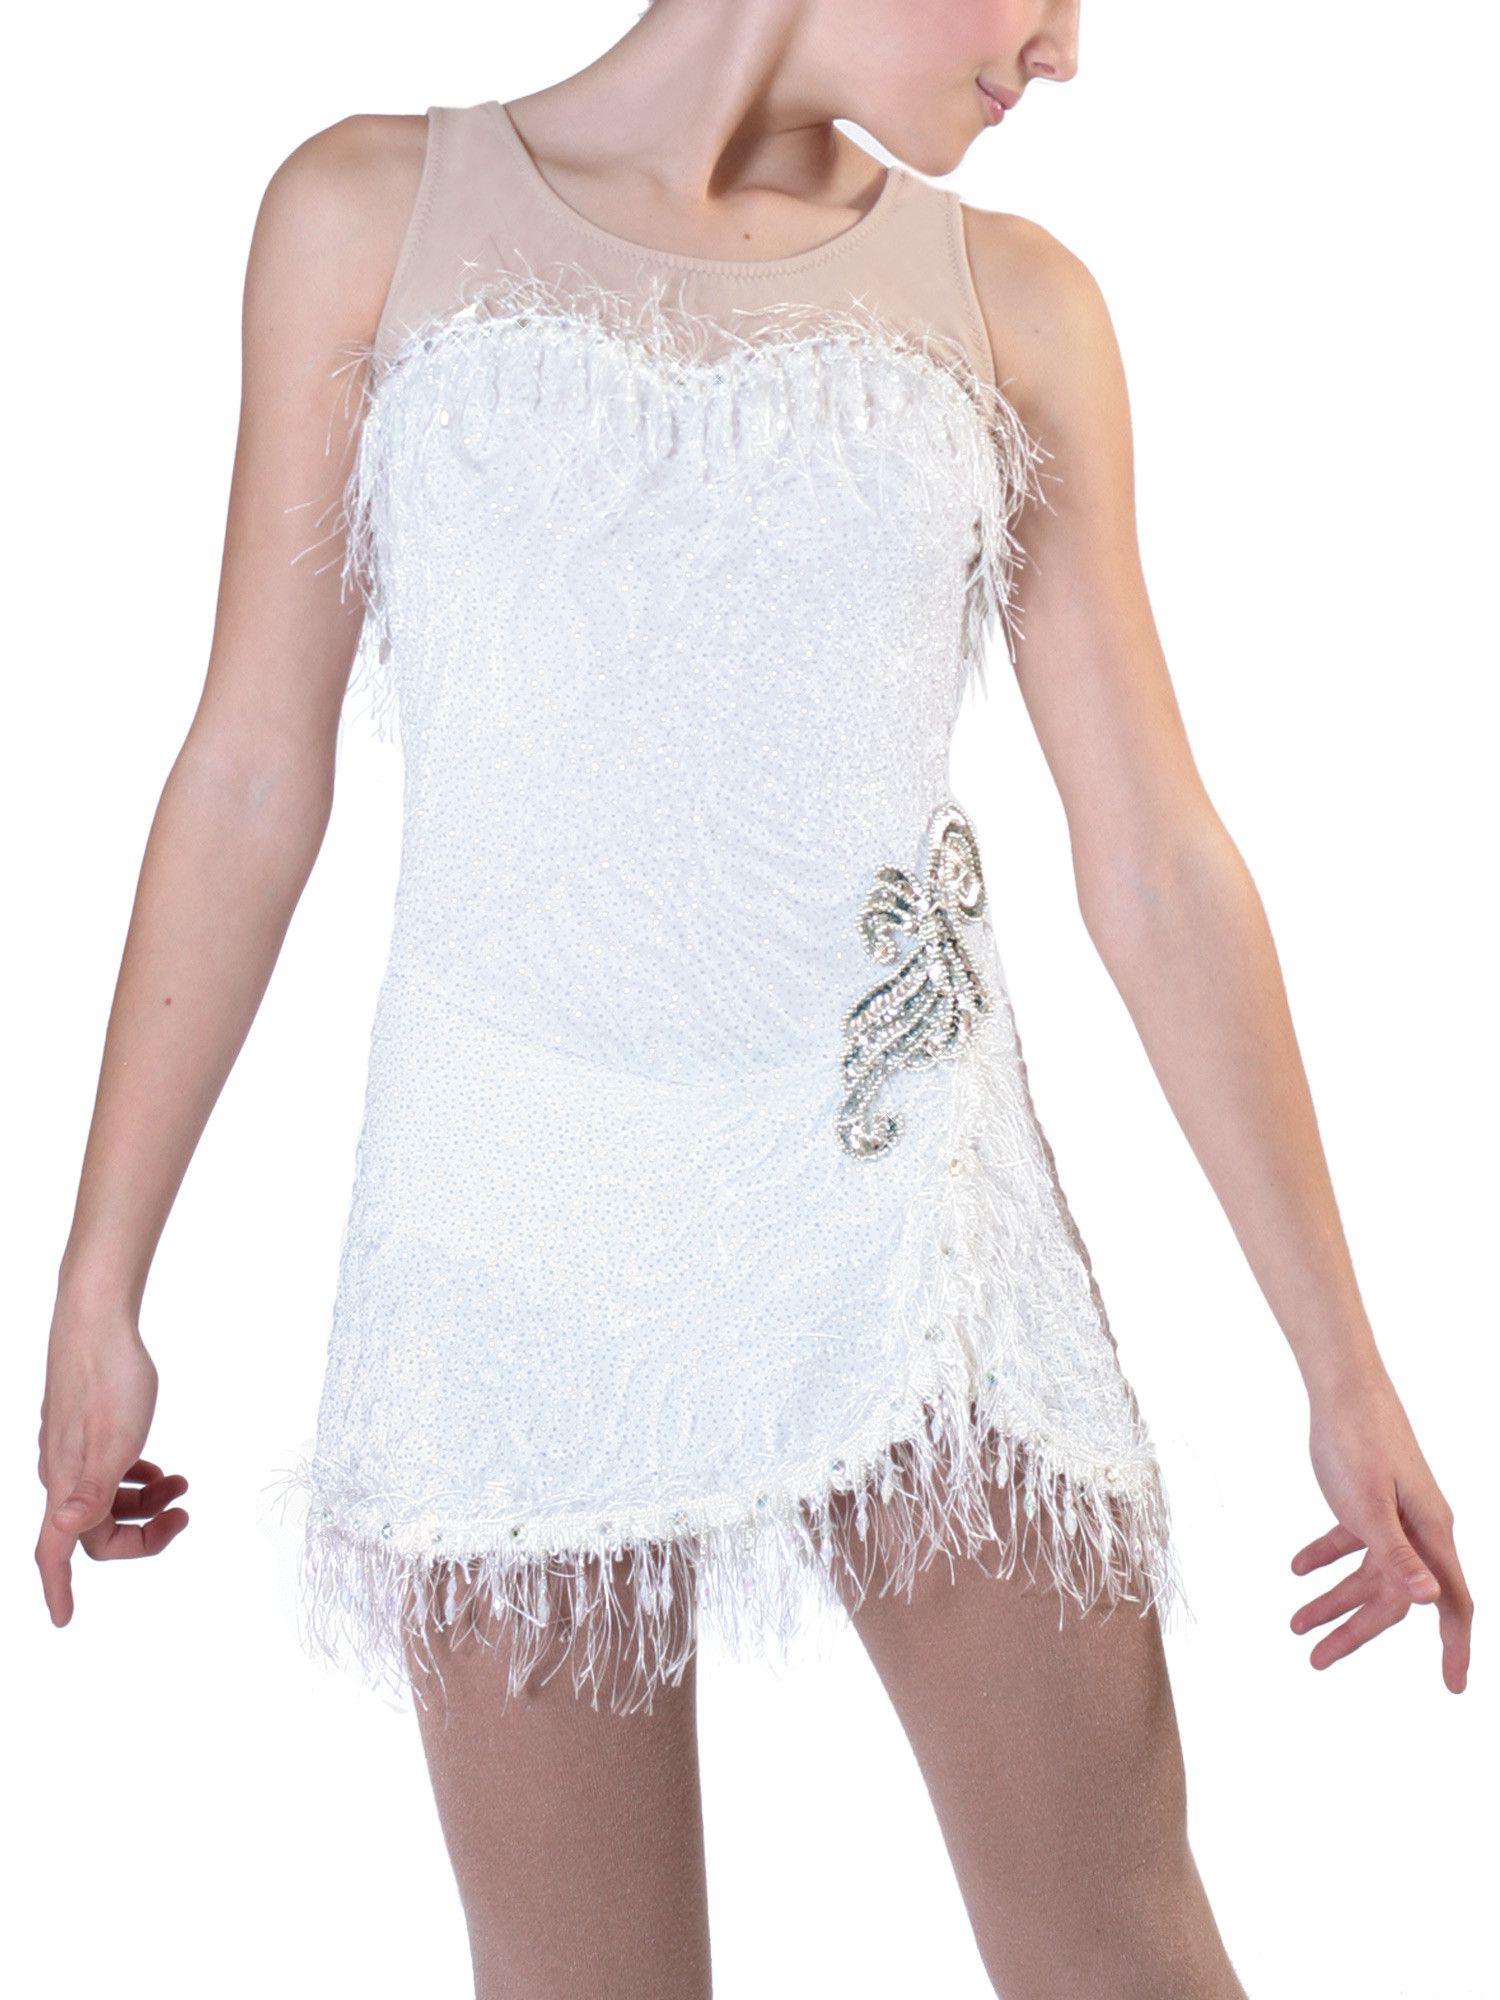 Sweetheart Skating Dress | Costumes | Pinterest | Skating dresses ...